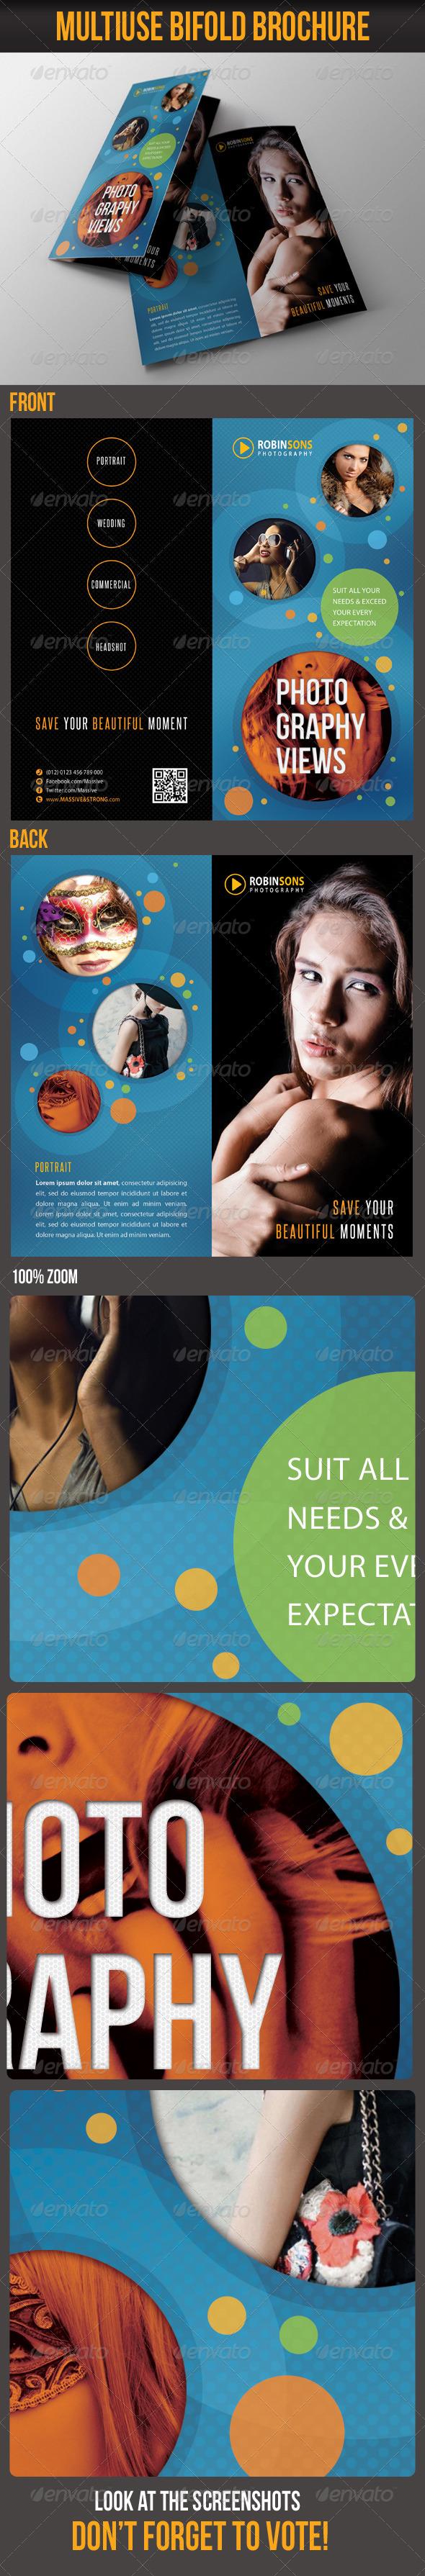 Multiuse Bifold Brochure 34 - Catalogs Brochures